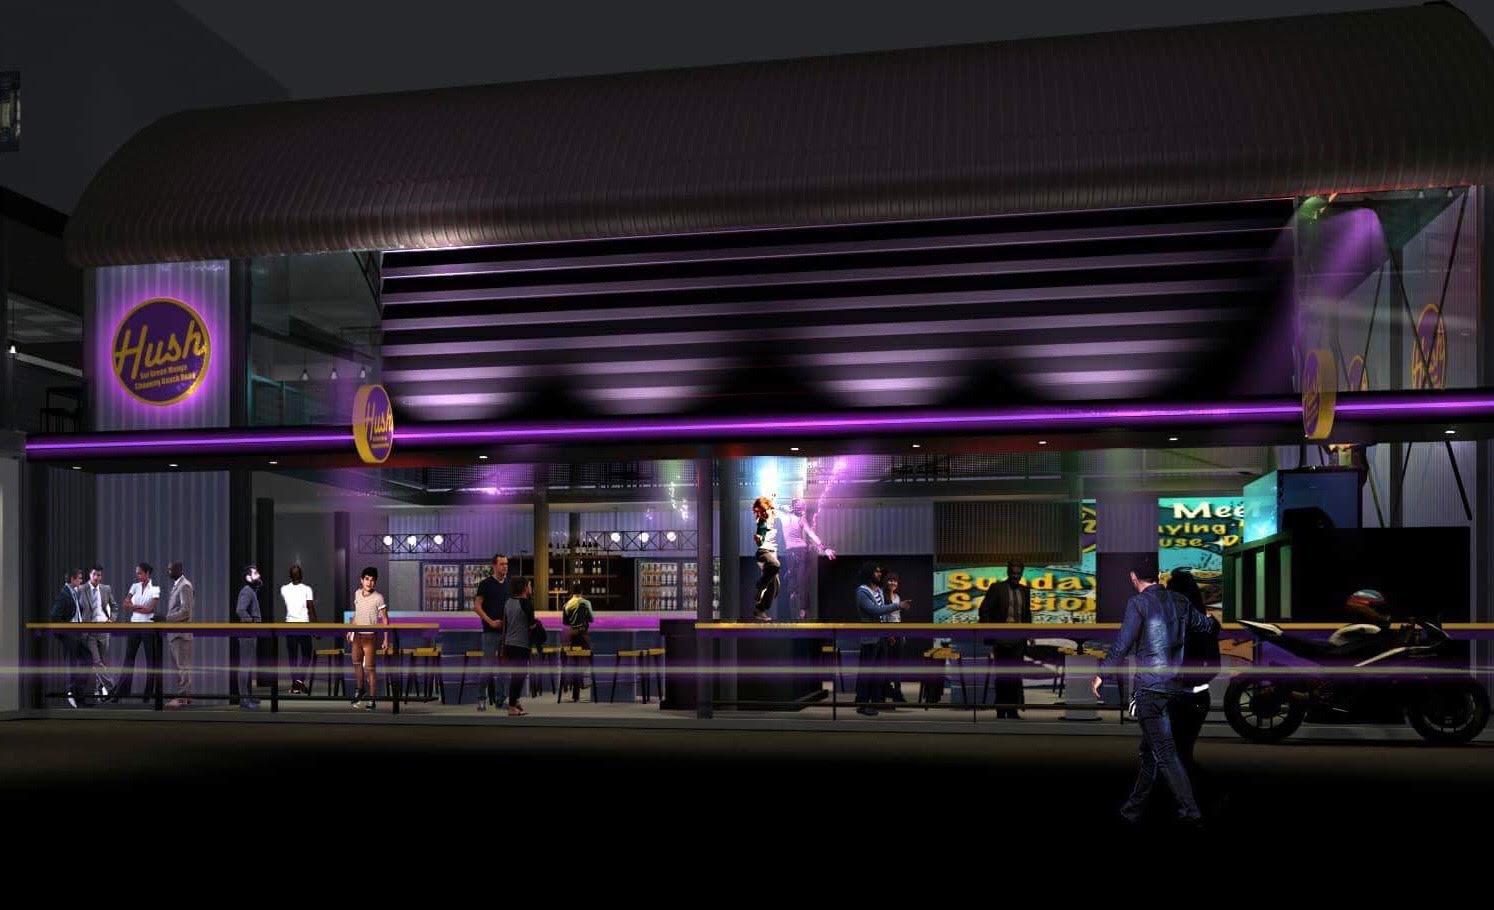 Image result for the hush bar samui